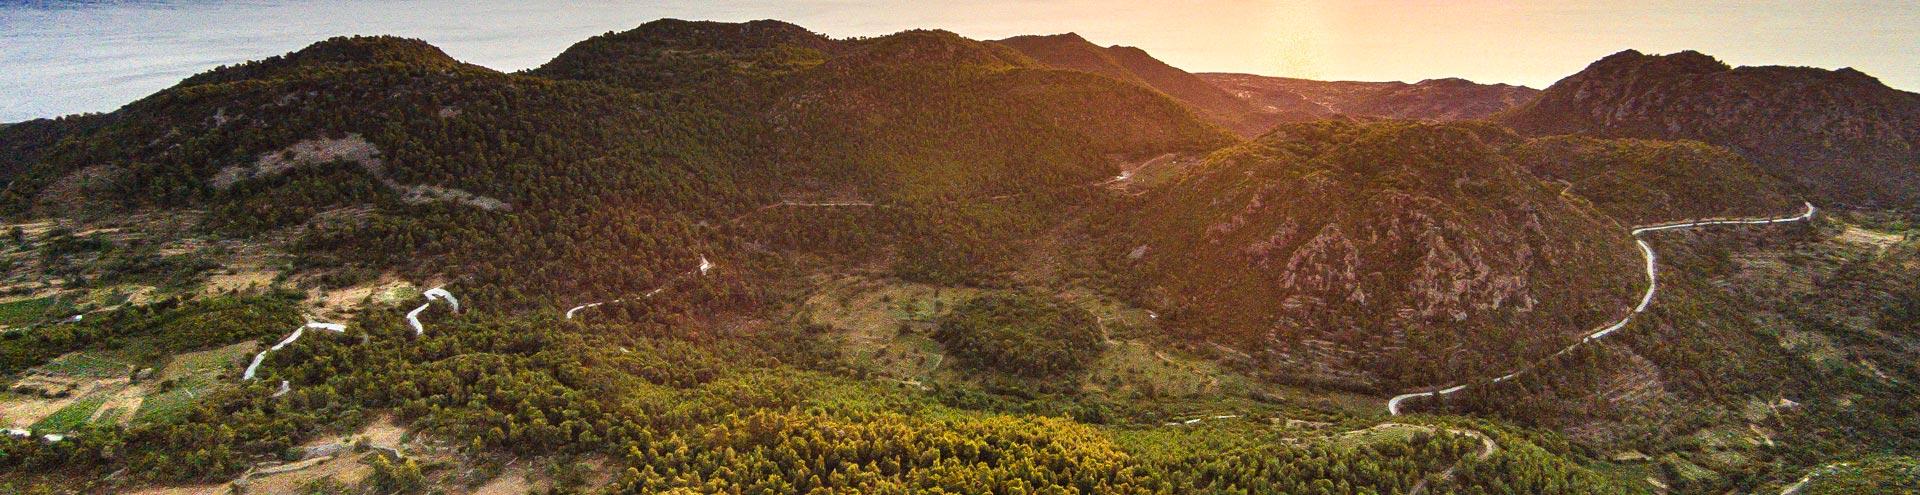 Der Vulkan Stavrolongos auf Methana